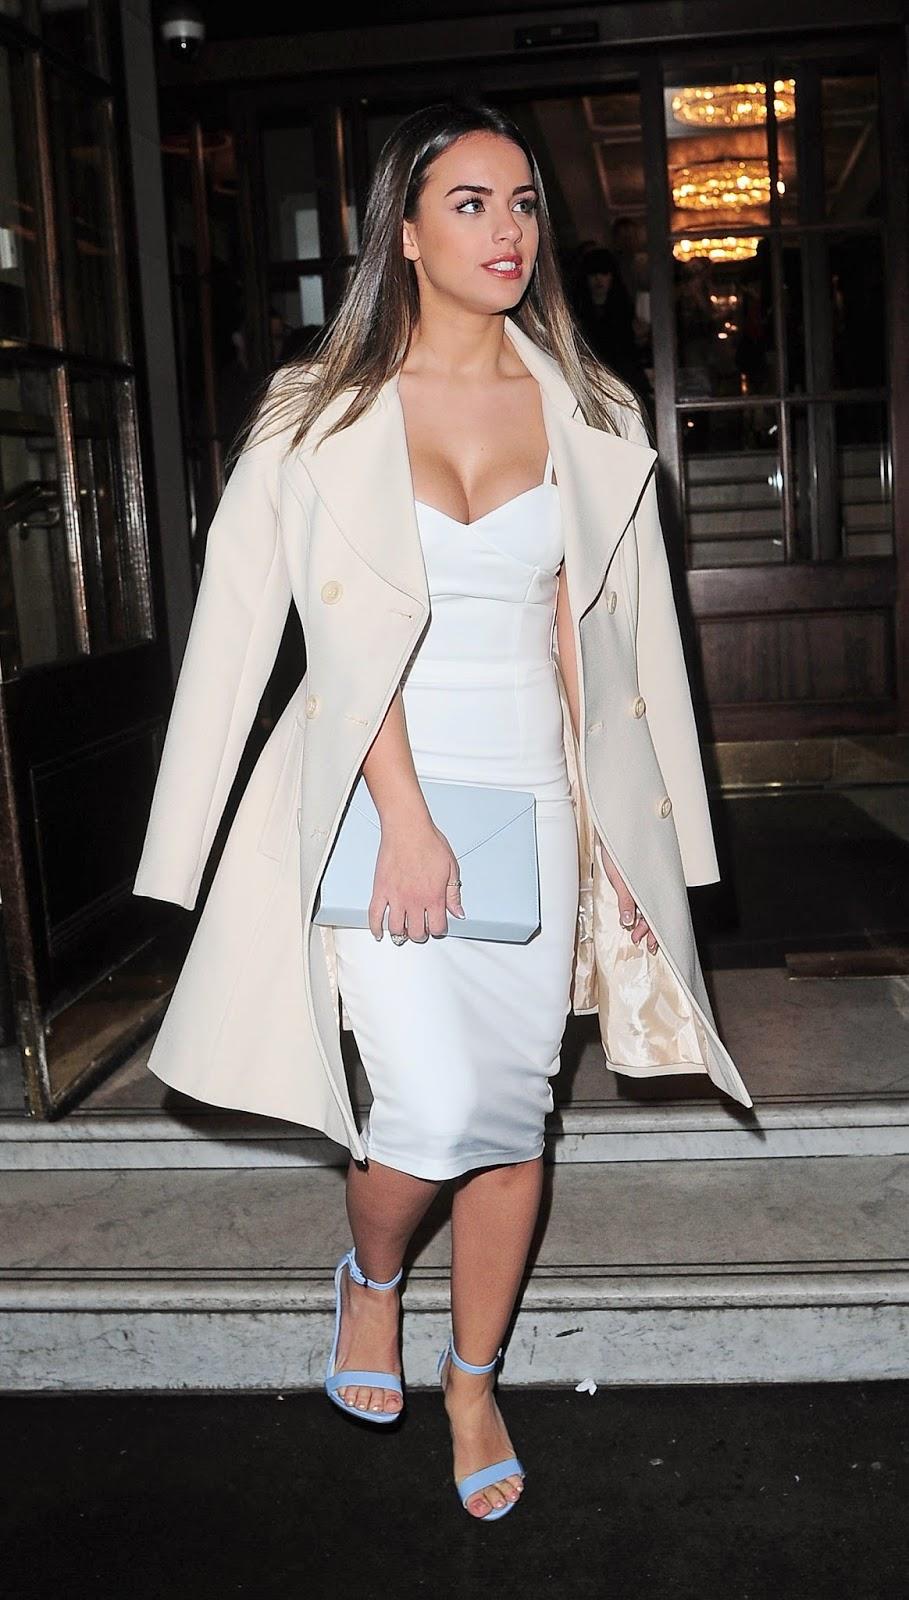 Amp magazines actress model georgia may foote london fashion week